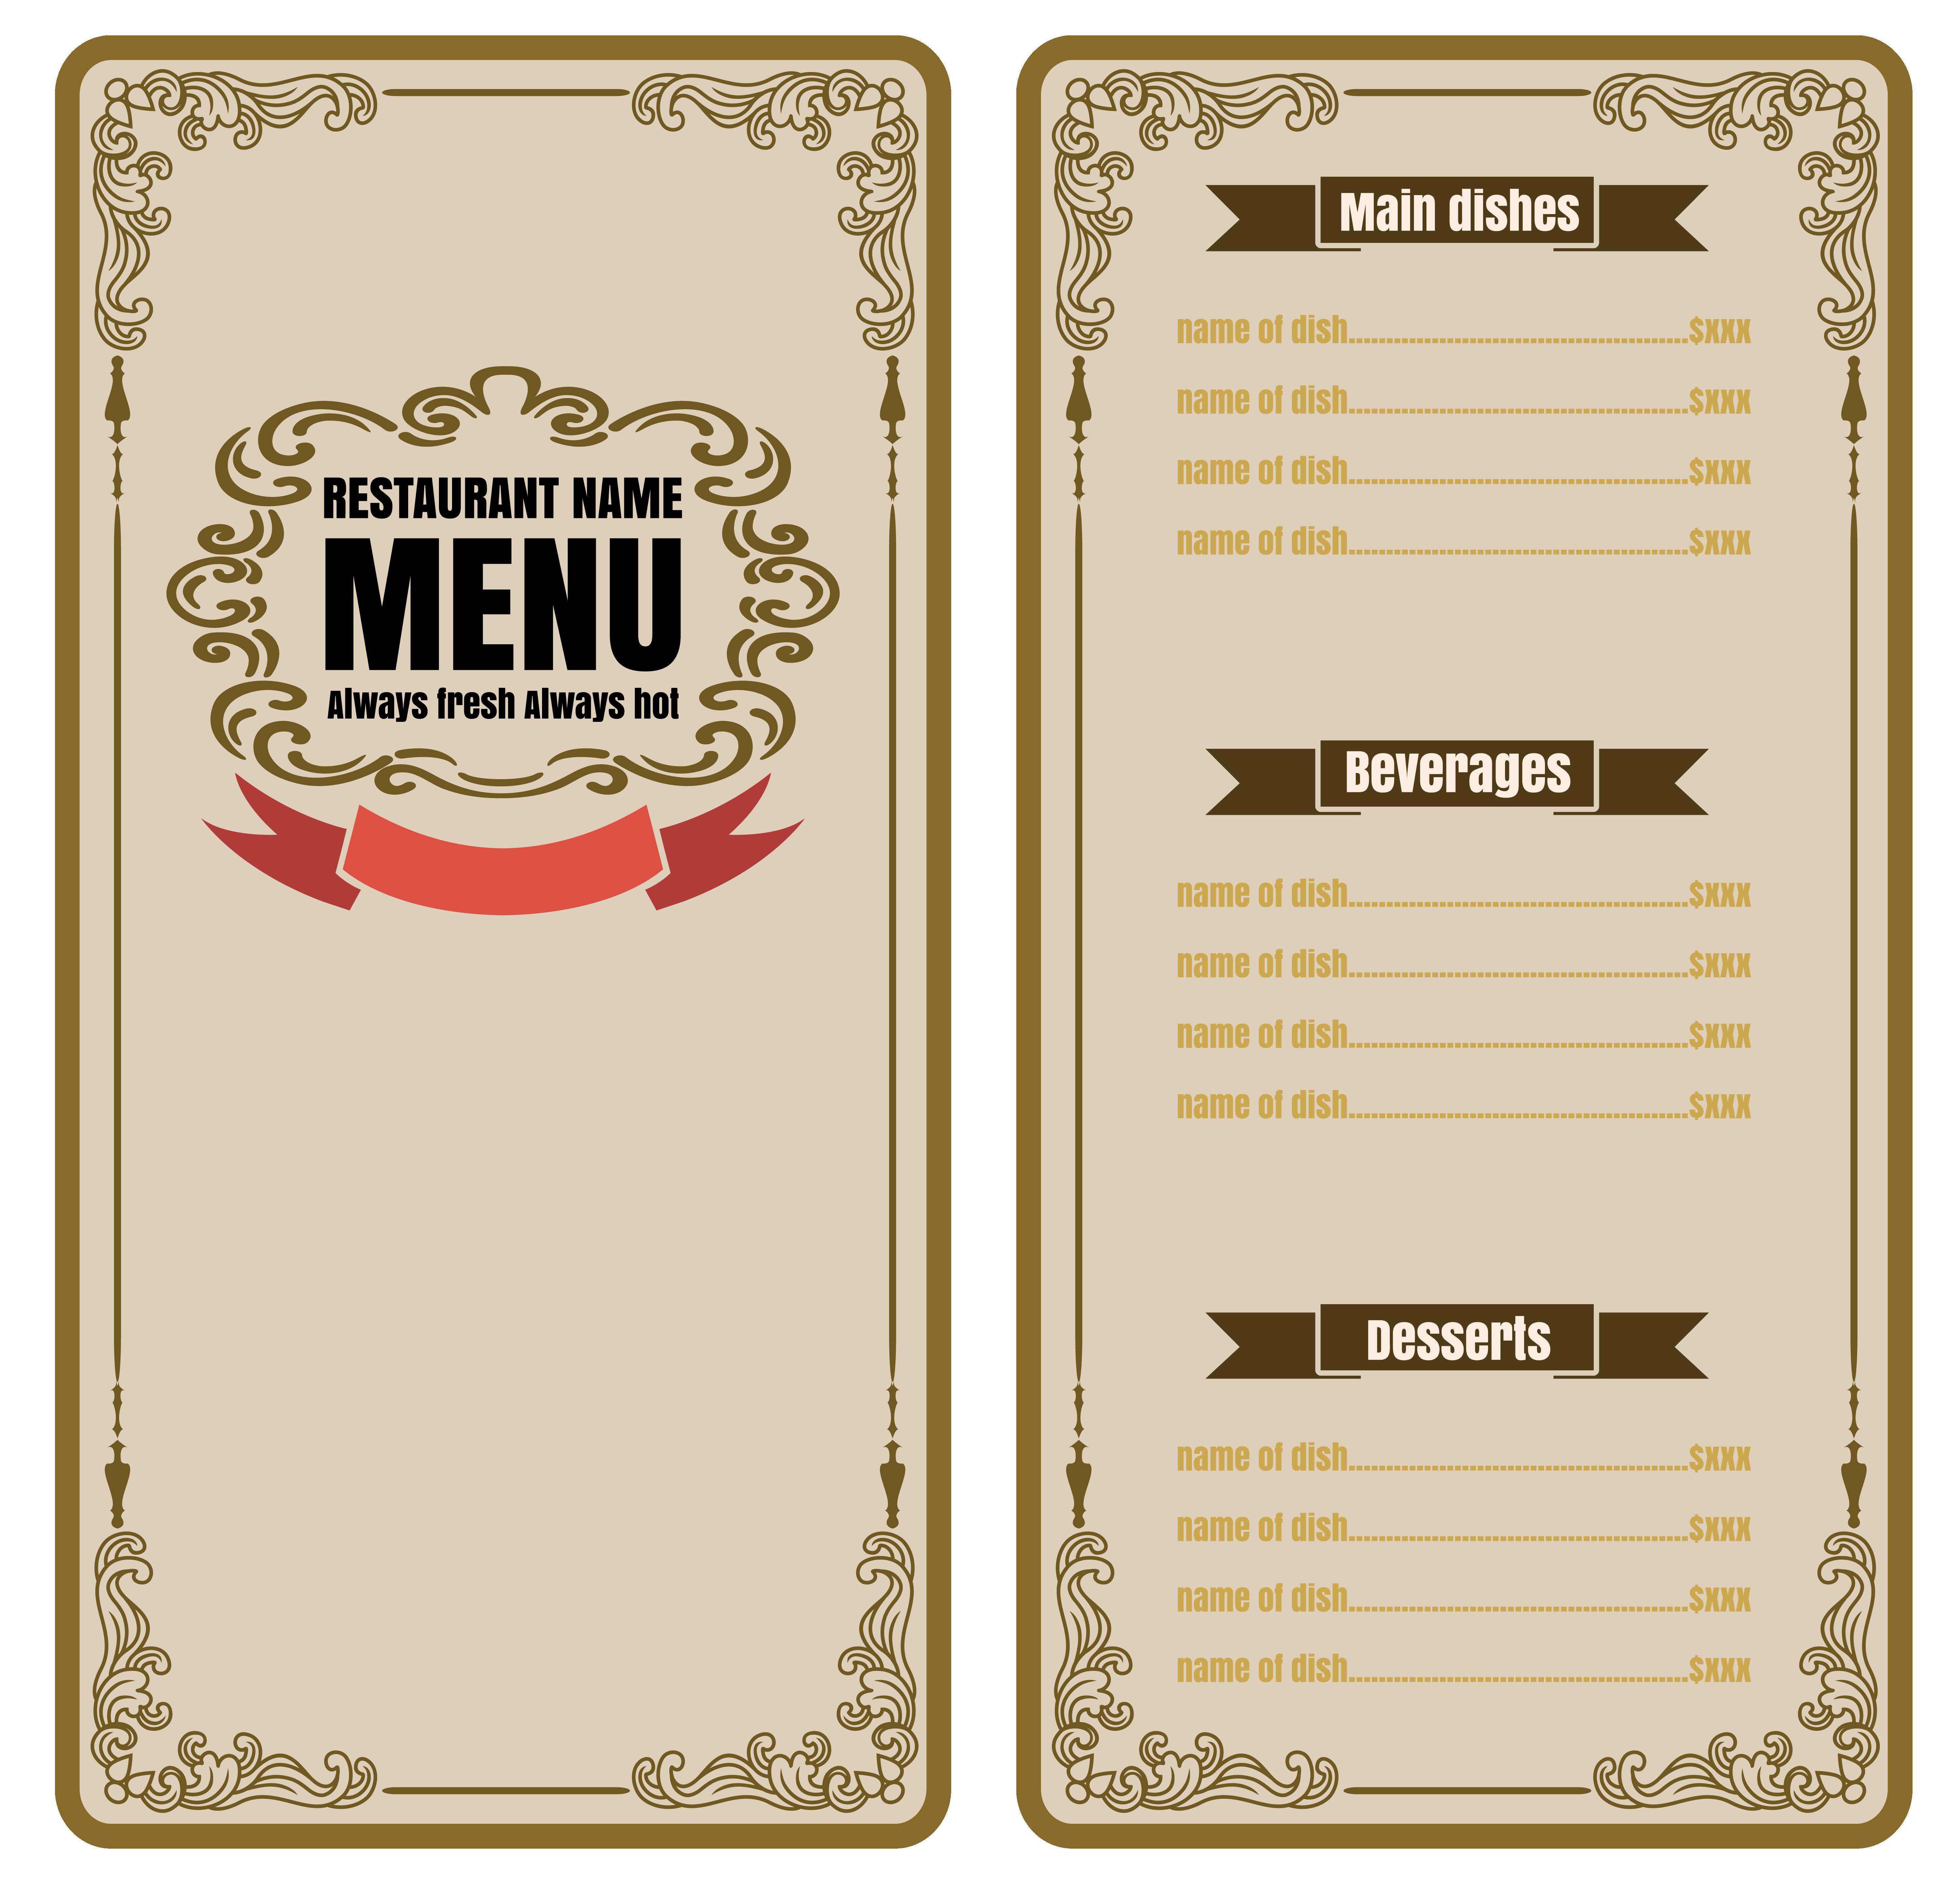 IMGBIN_cafe-menu-restaurant-png_xGvY40Cz